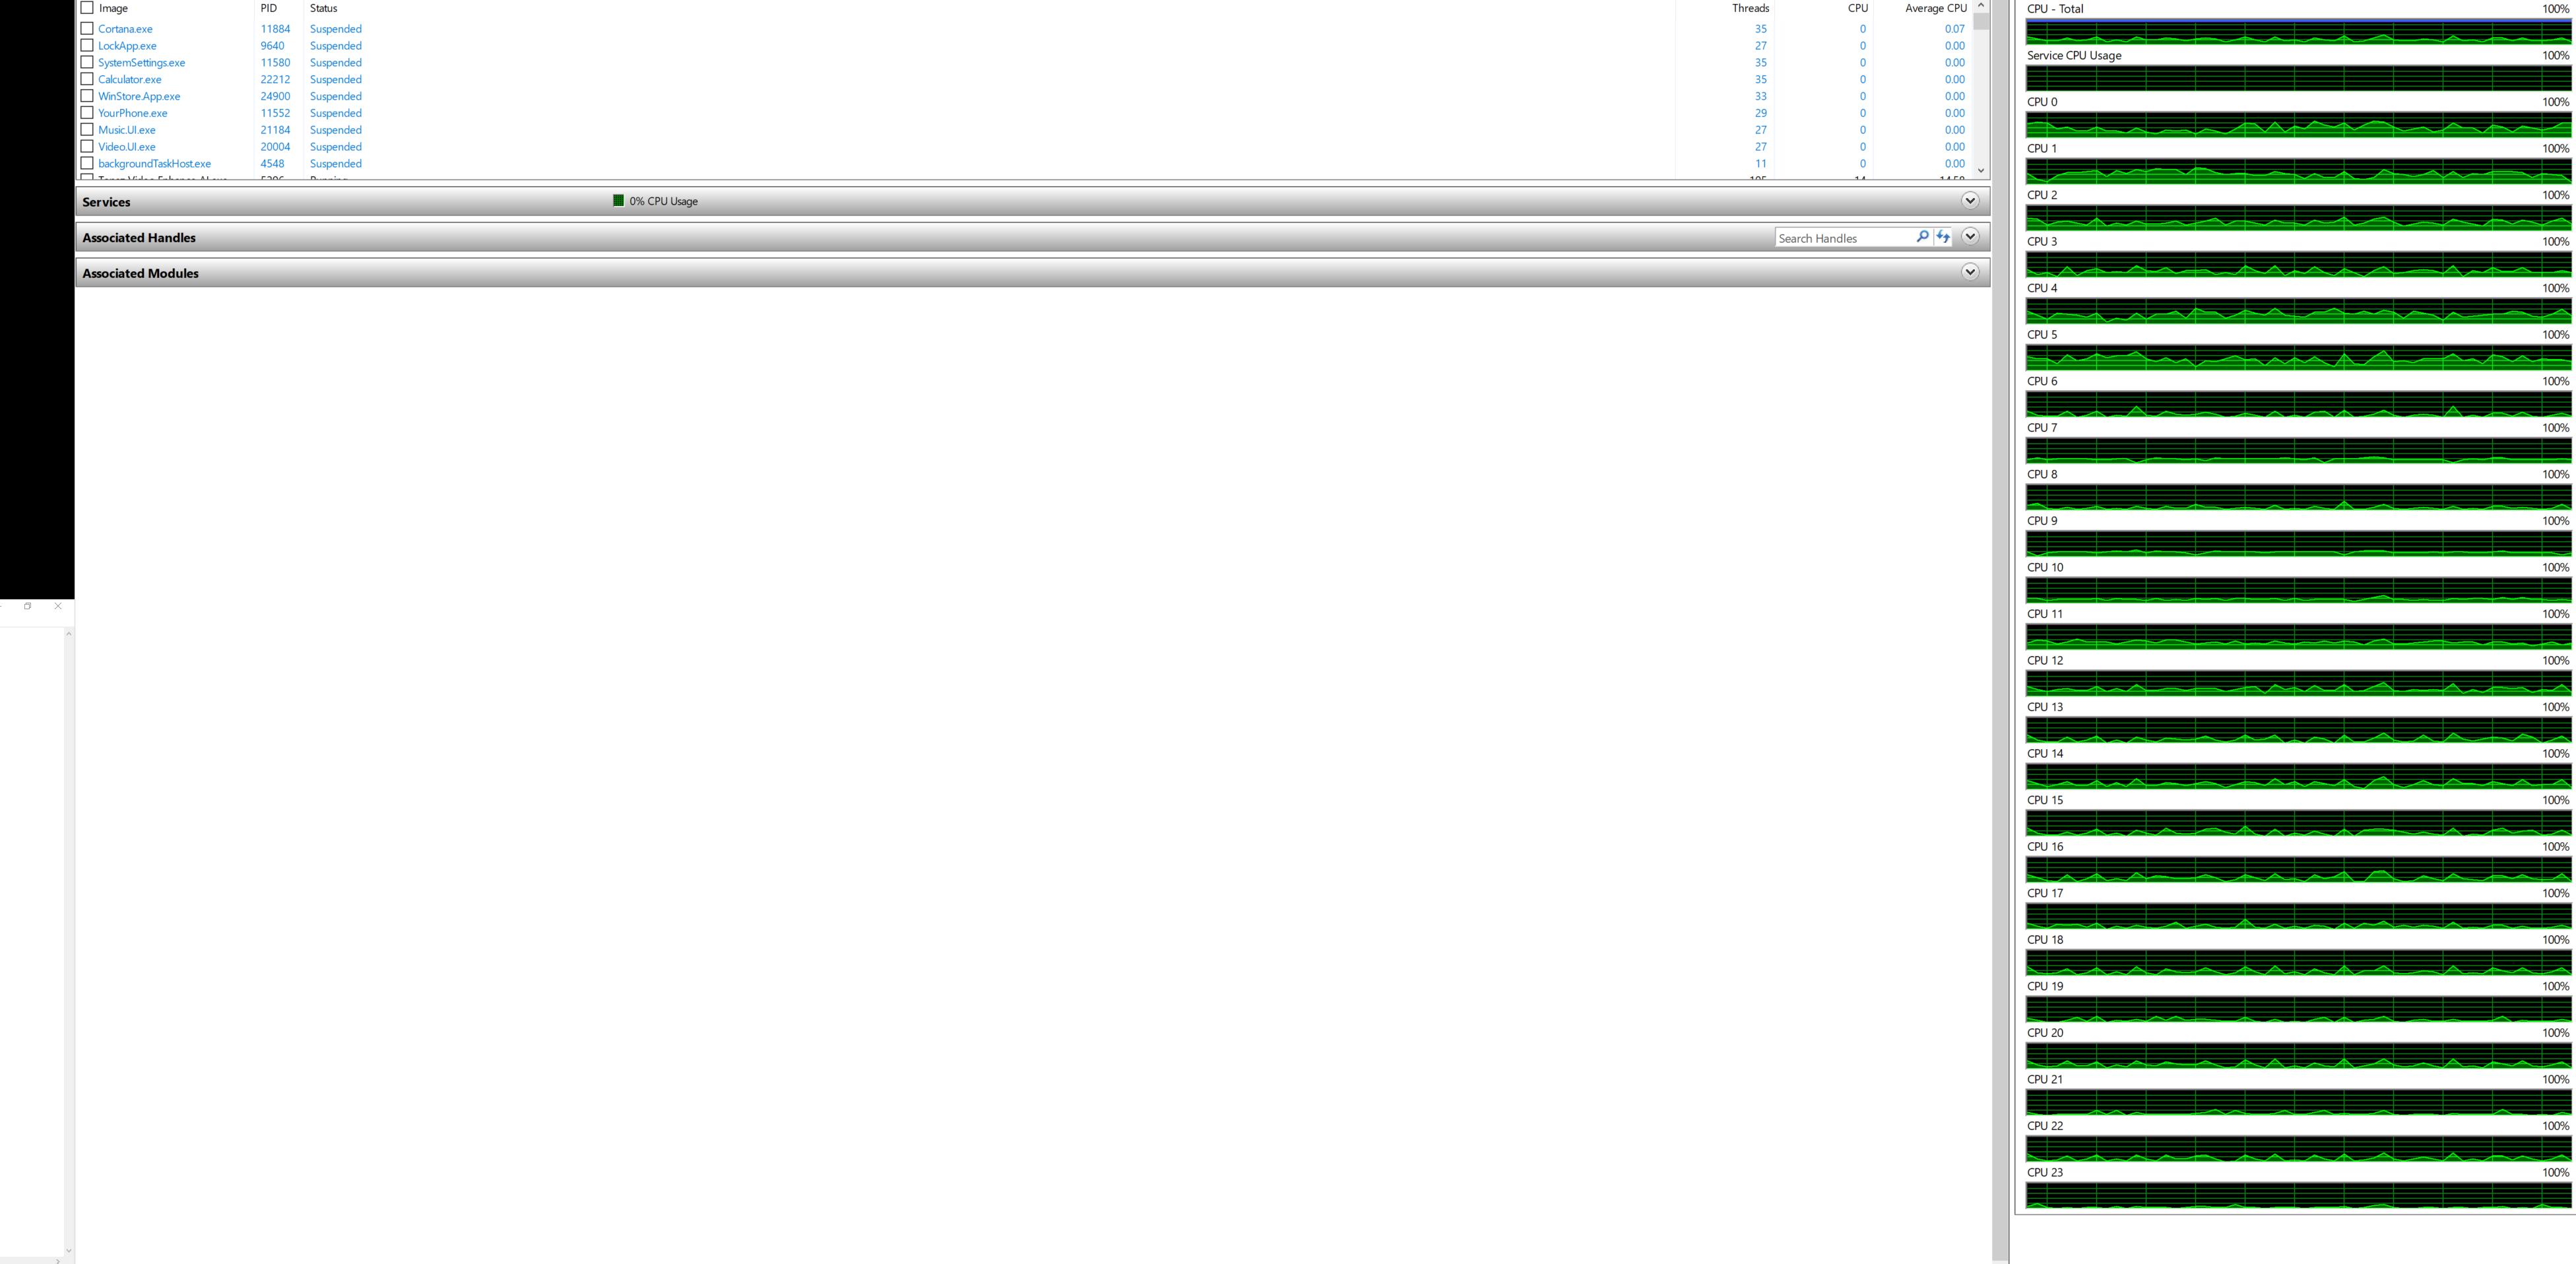 Screenshot 2021-04-21 081149.png